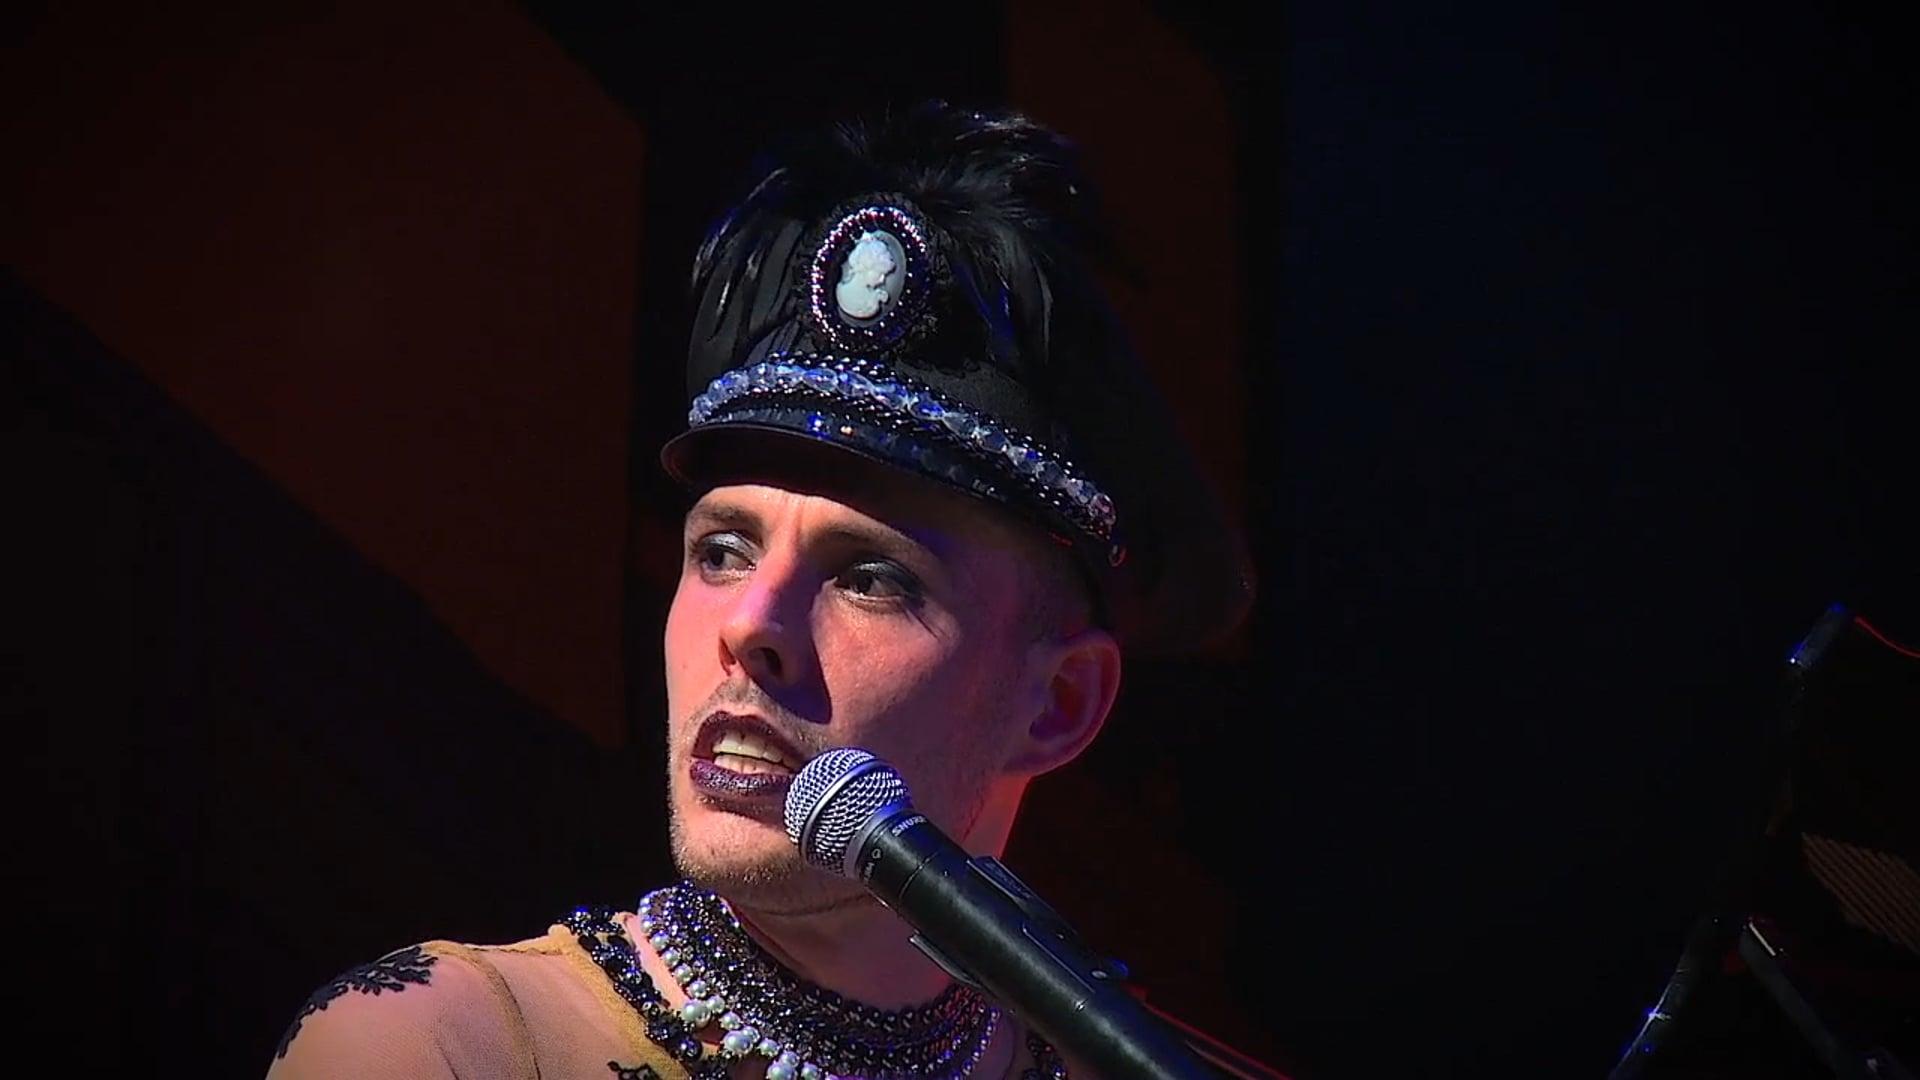 What makes a man a man - song